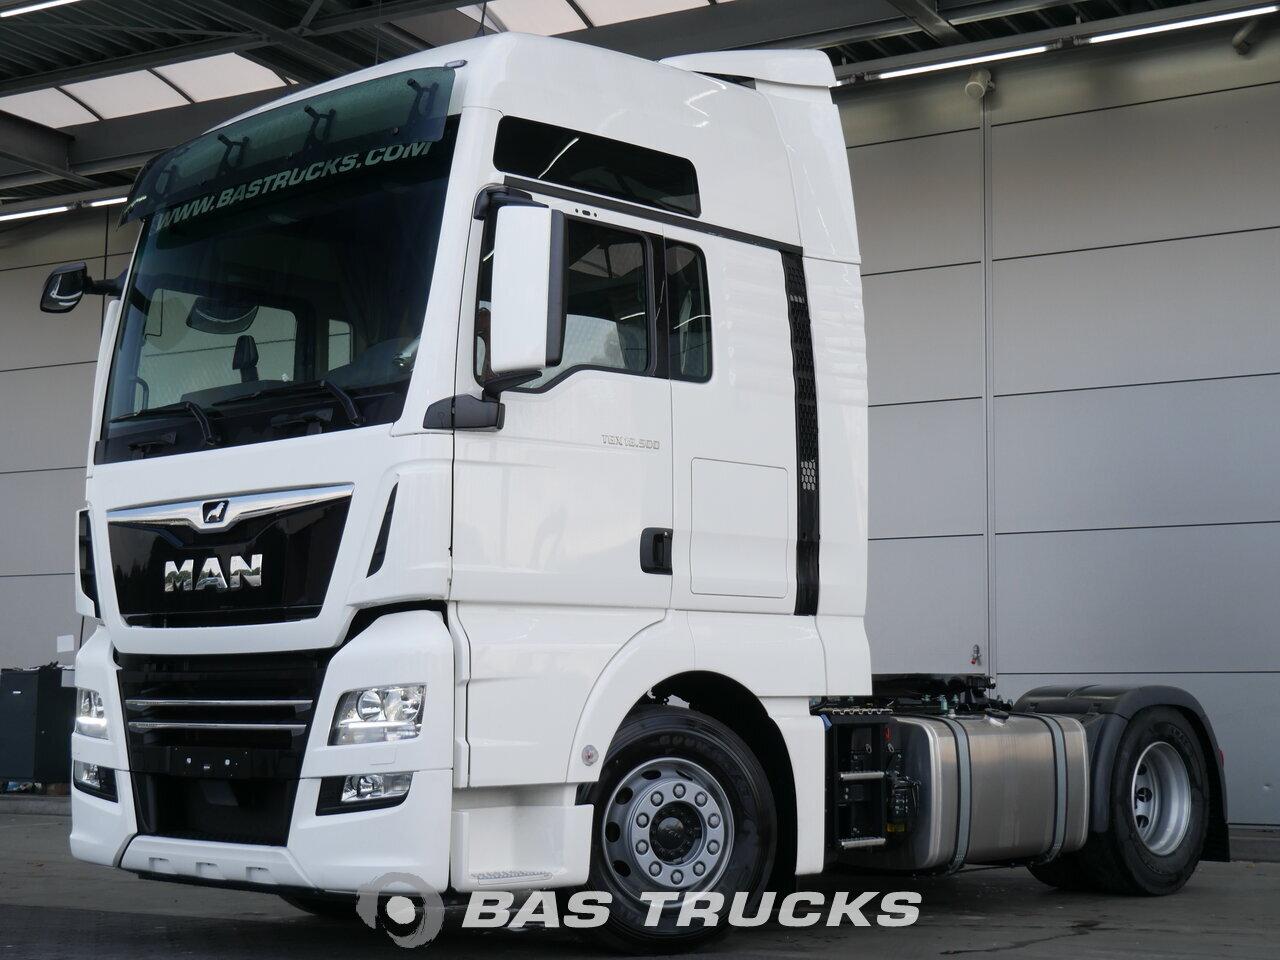 man tgx xxl tracteur euro 6 78200 bas trucks. Black Bedroom Furniture Sets. Home Design Ideas